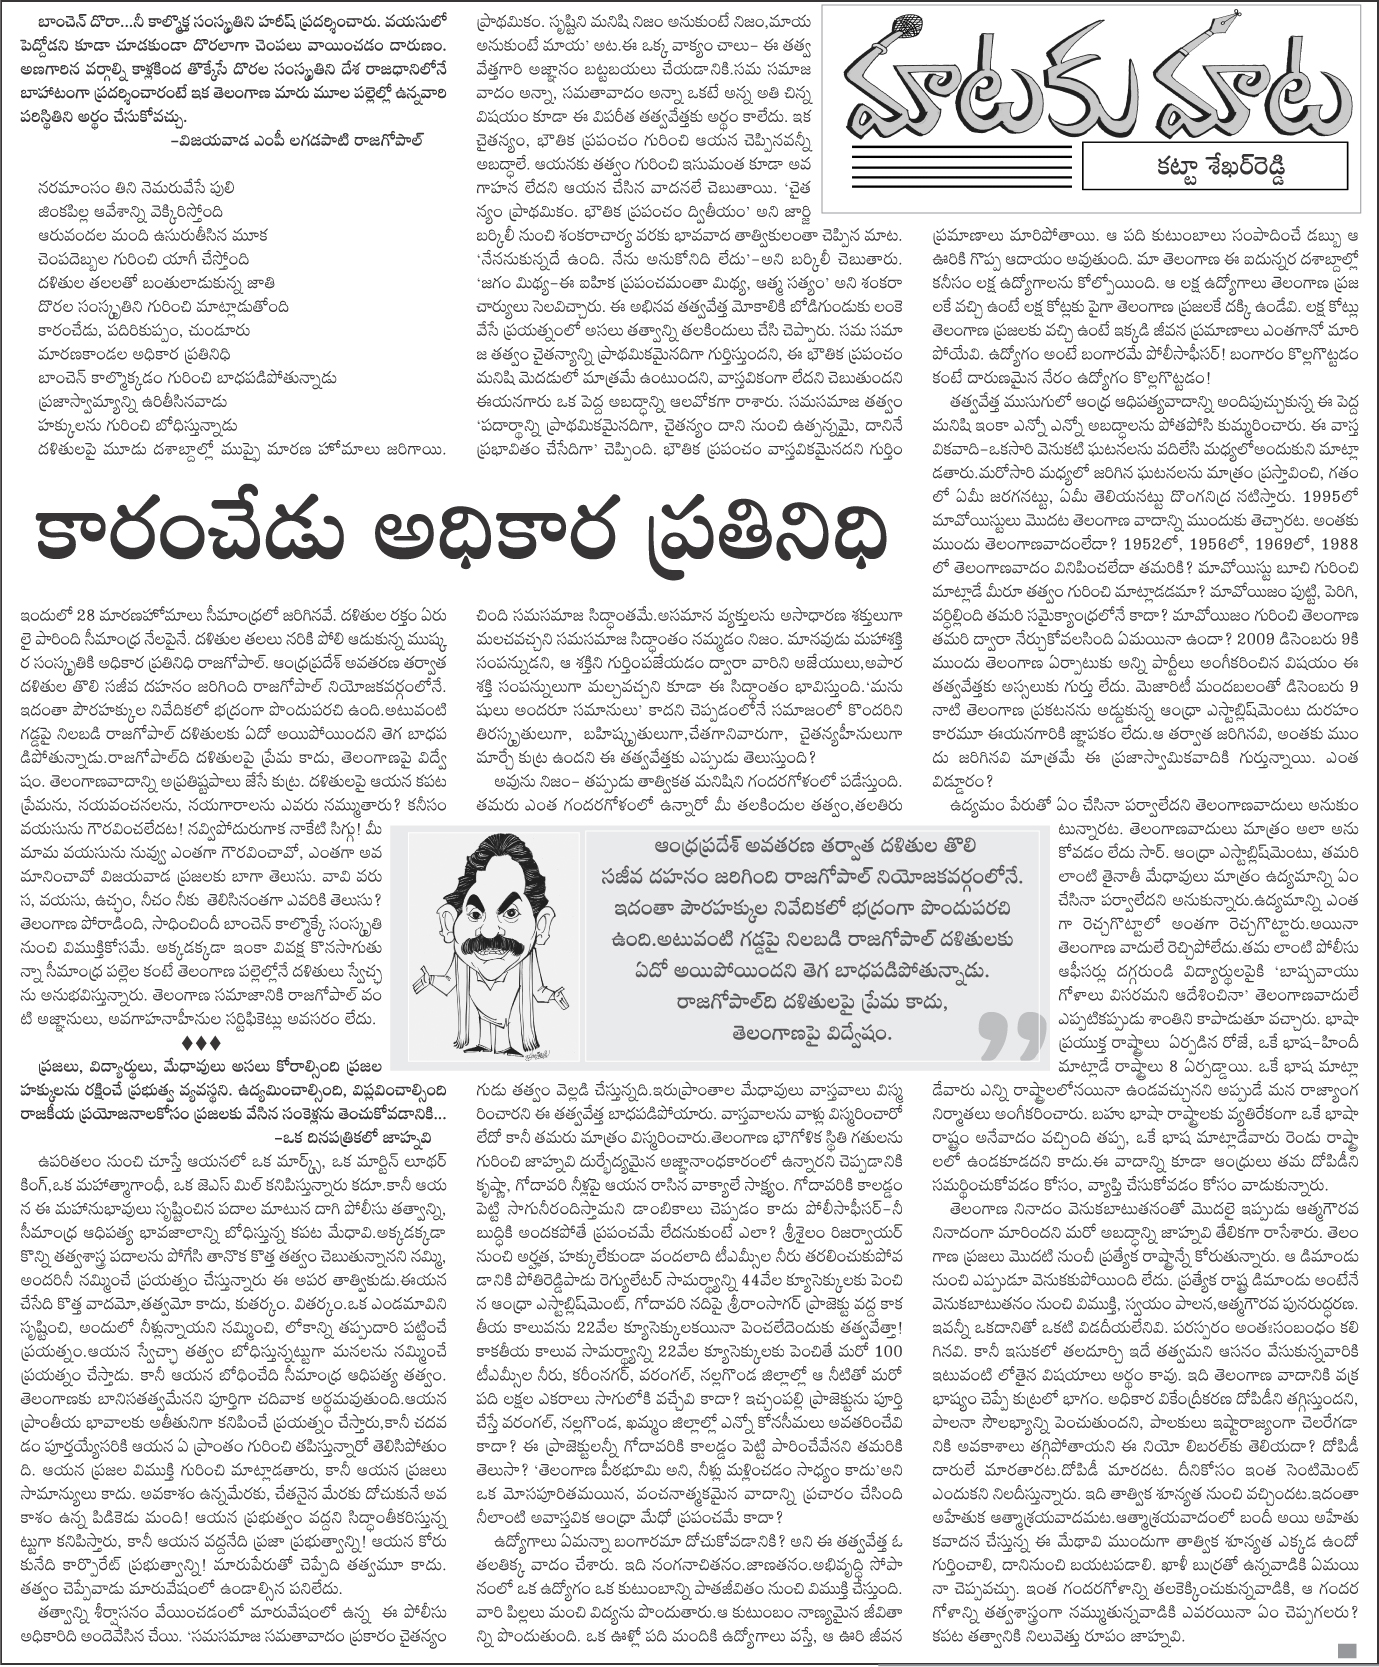 23-07-11 NT Maataku Maata - Karamchedu Adhikaara Prathinidhi